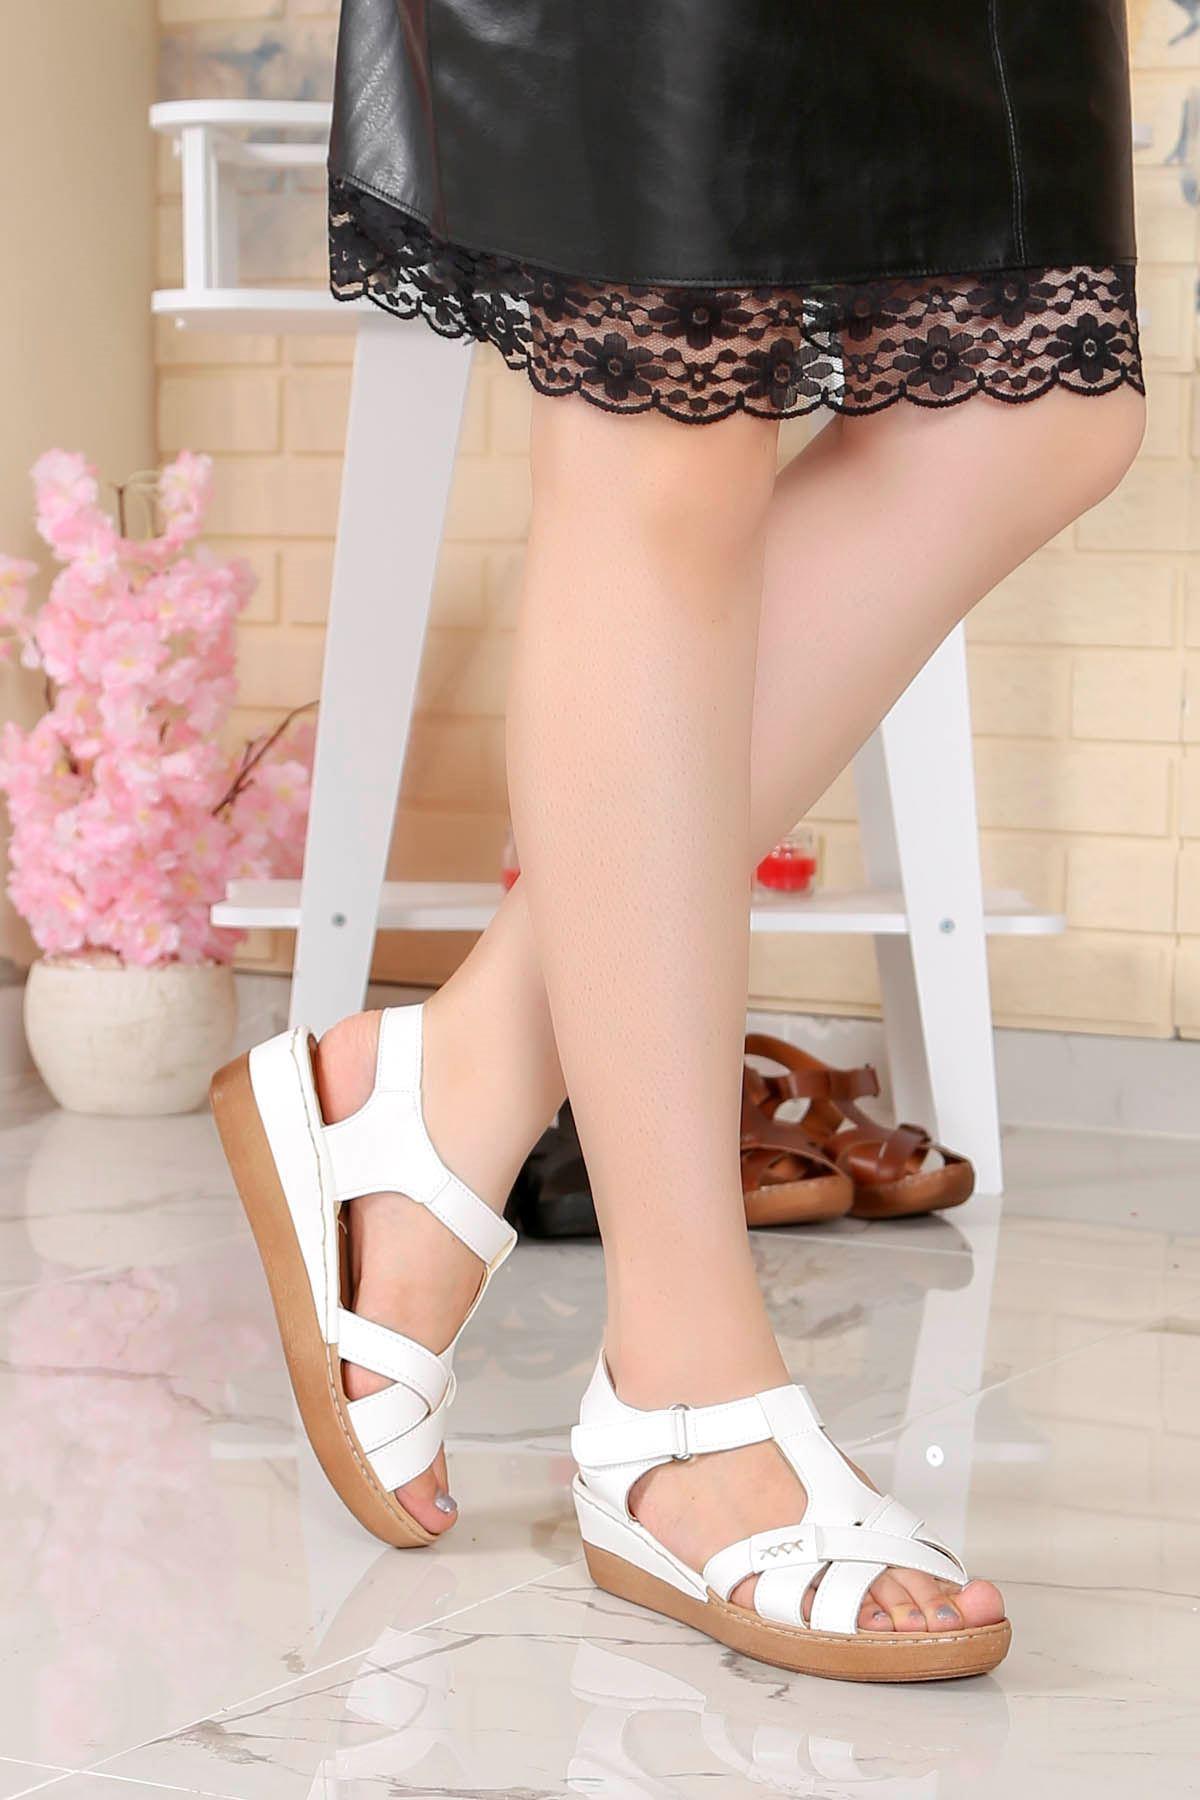 My-Fit-18 Dolgu Taban Sandalet Beyaz Deri